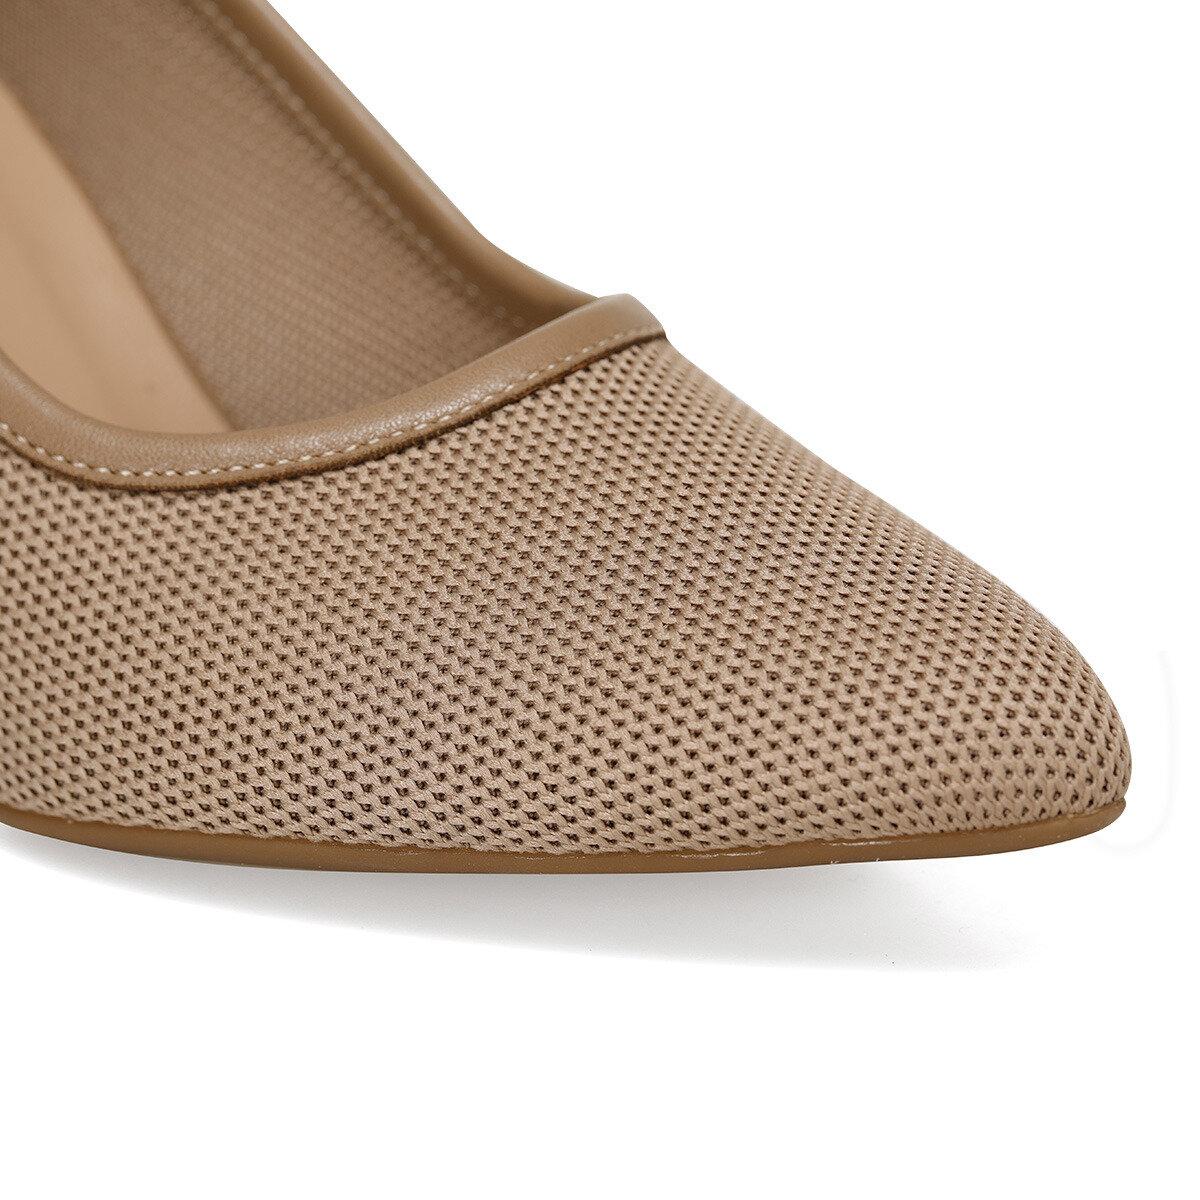 KNITTED Vizon Kadın Topuklu Ayakkabı